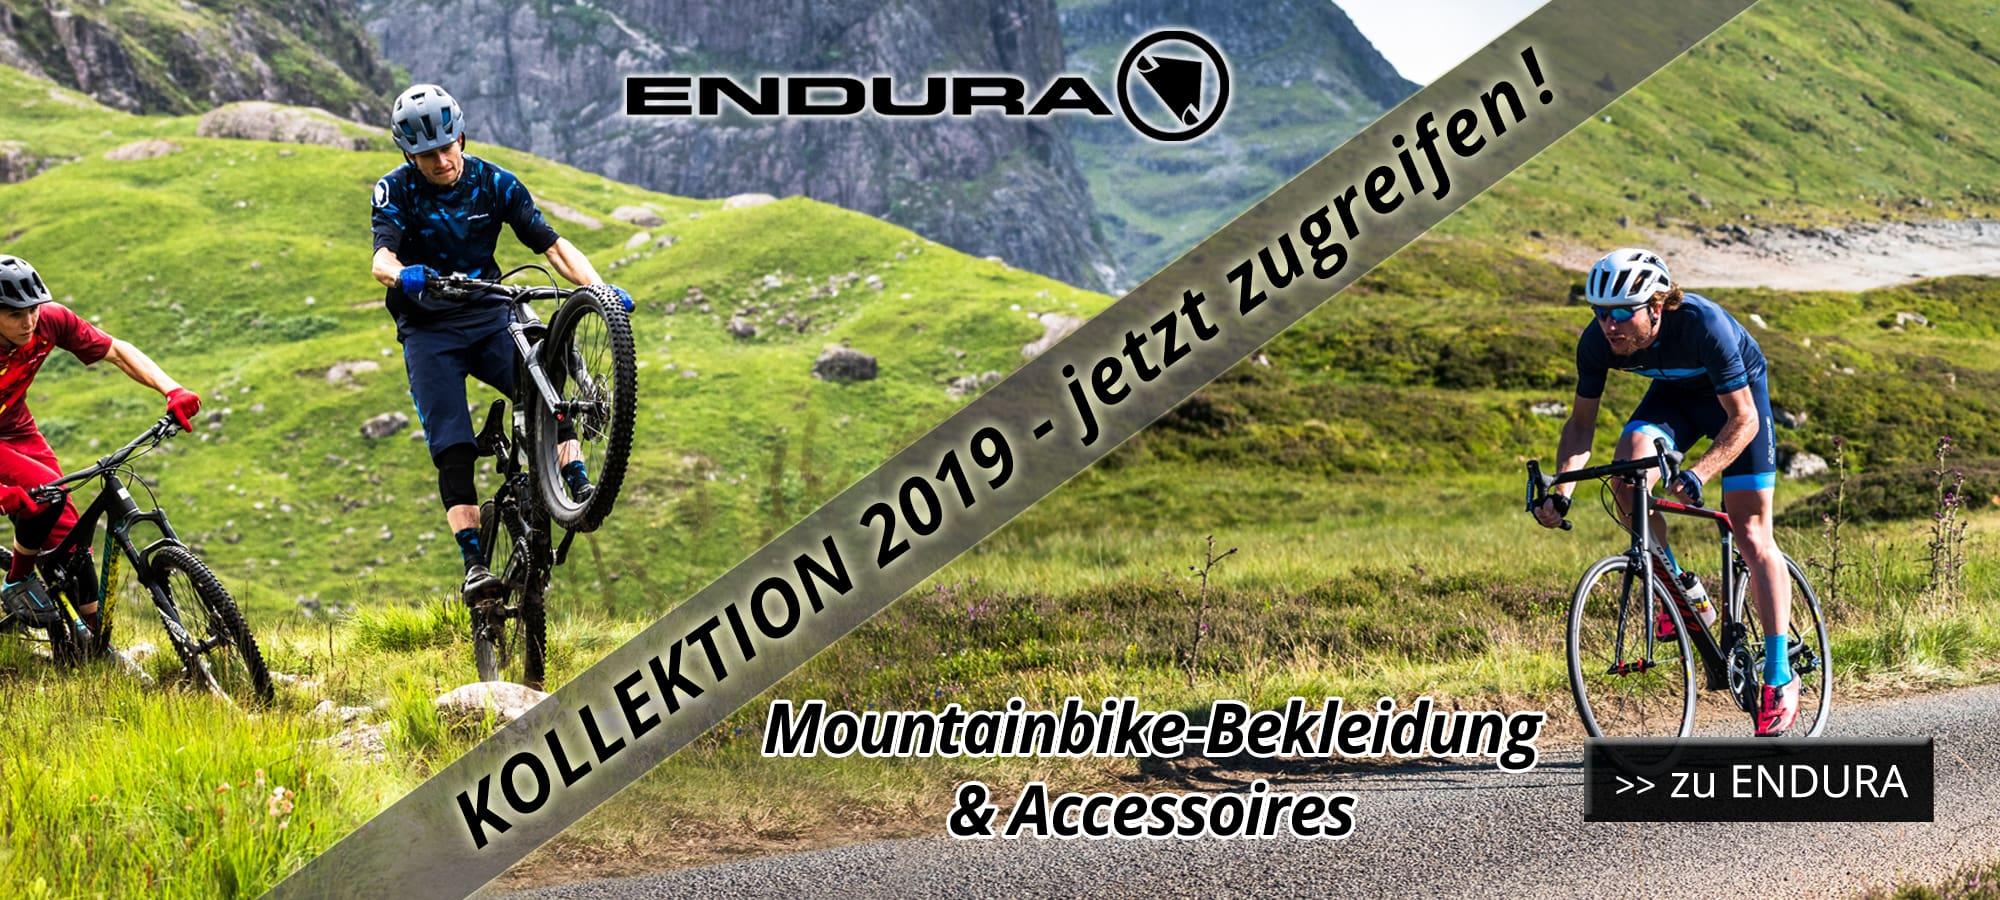 Endura 2019 MTB-Bekleidung & Accessoires